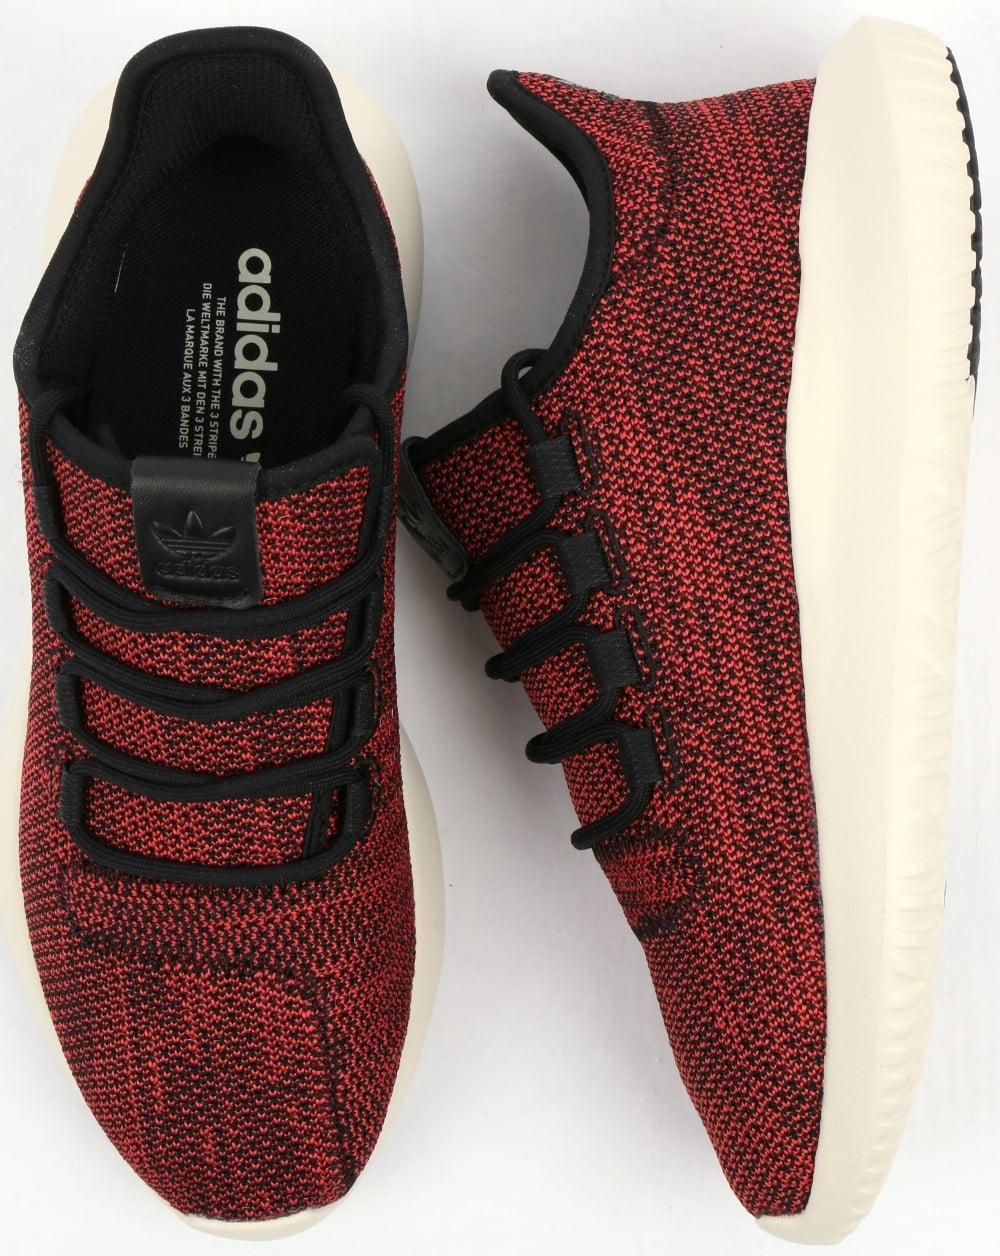 f135478fb Adidas Tubular Shadow CK Trainers Black/Scarlet,originals,shoes,mens